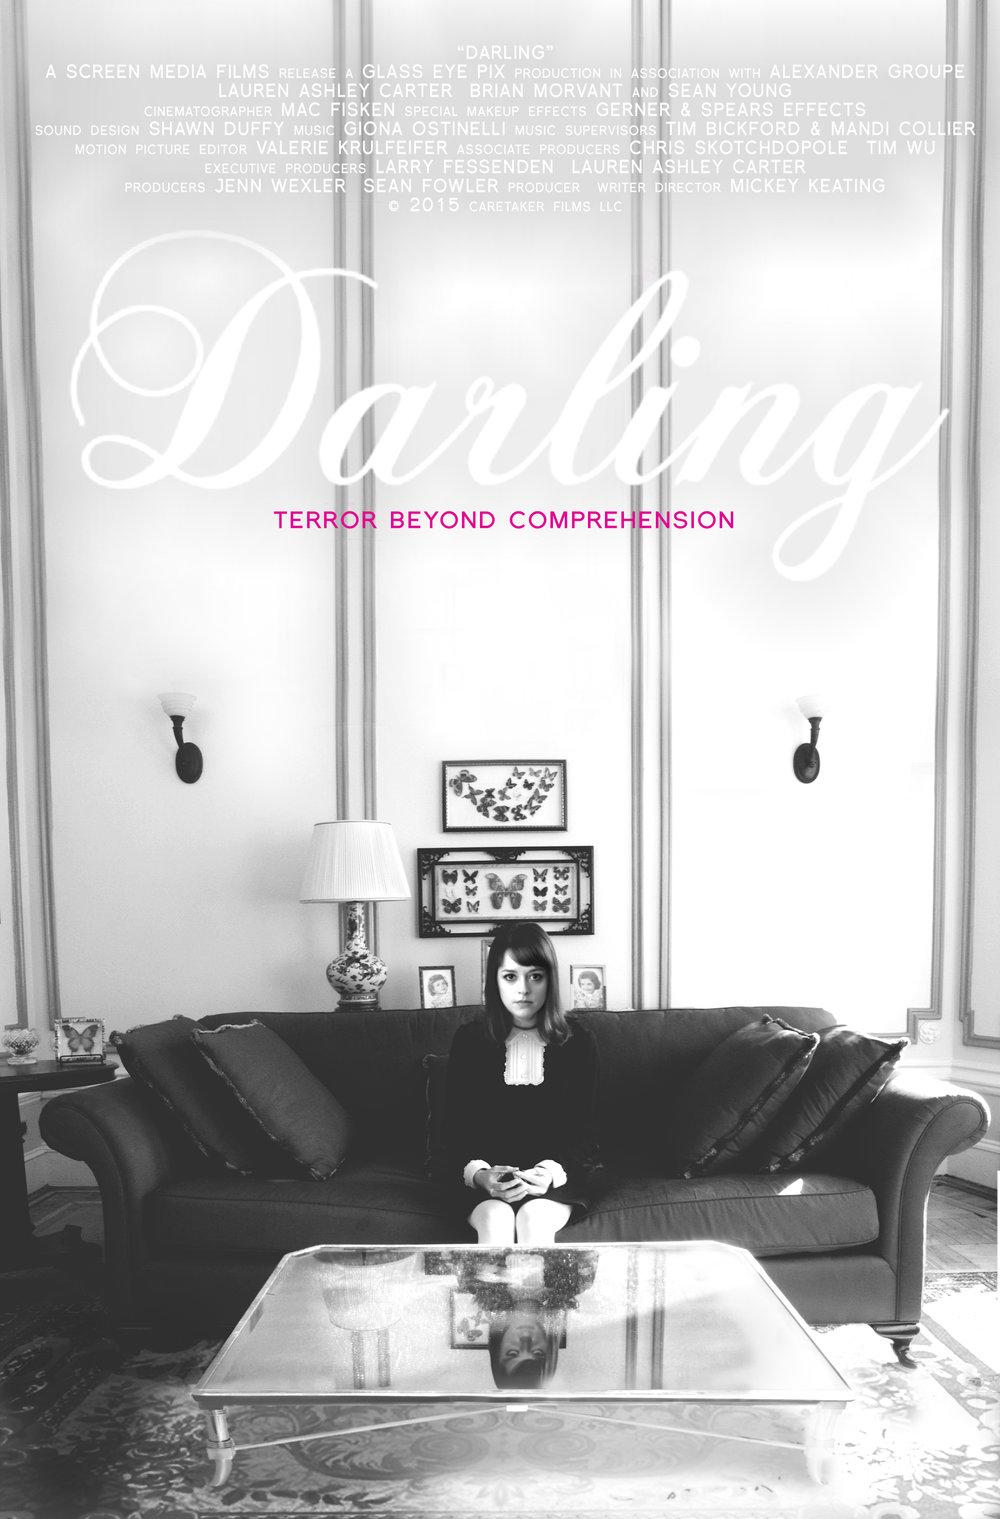 darling poster w titles.jpg